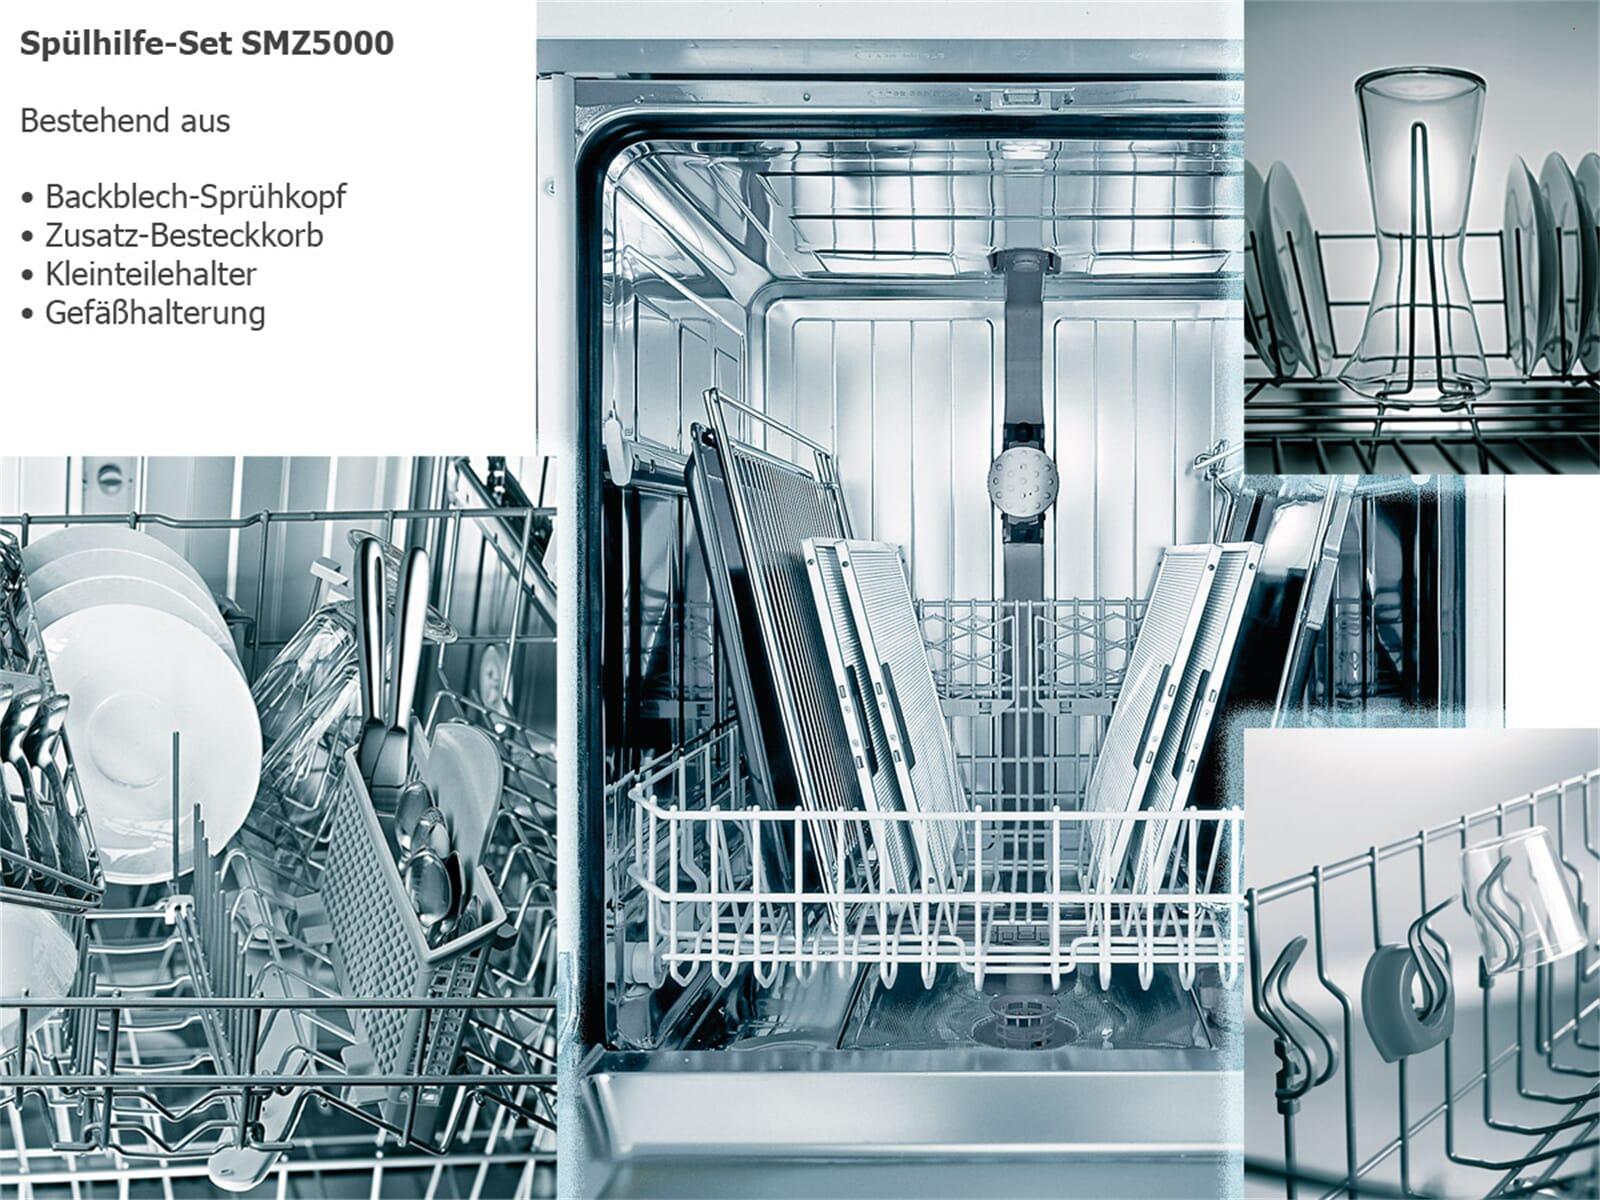 Bosch SMZ5000 Spülhilfe-Set (ActiveWater)